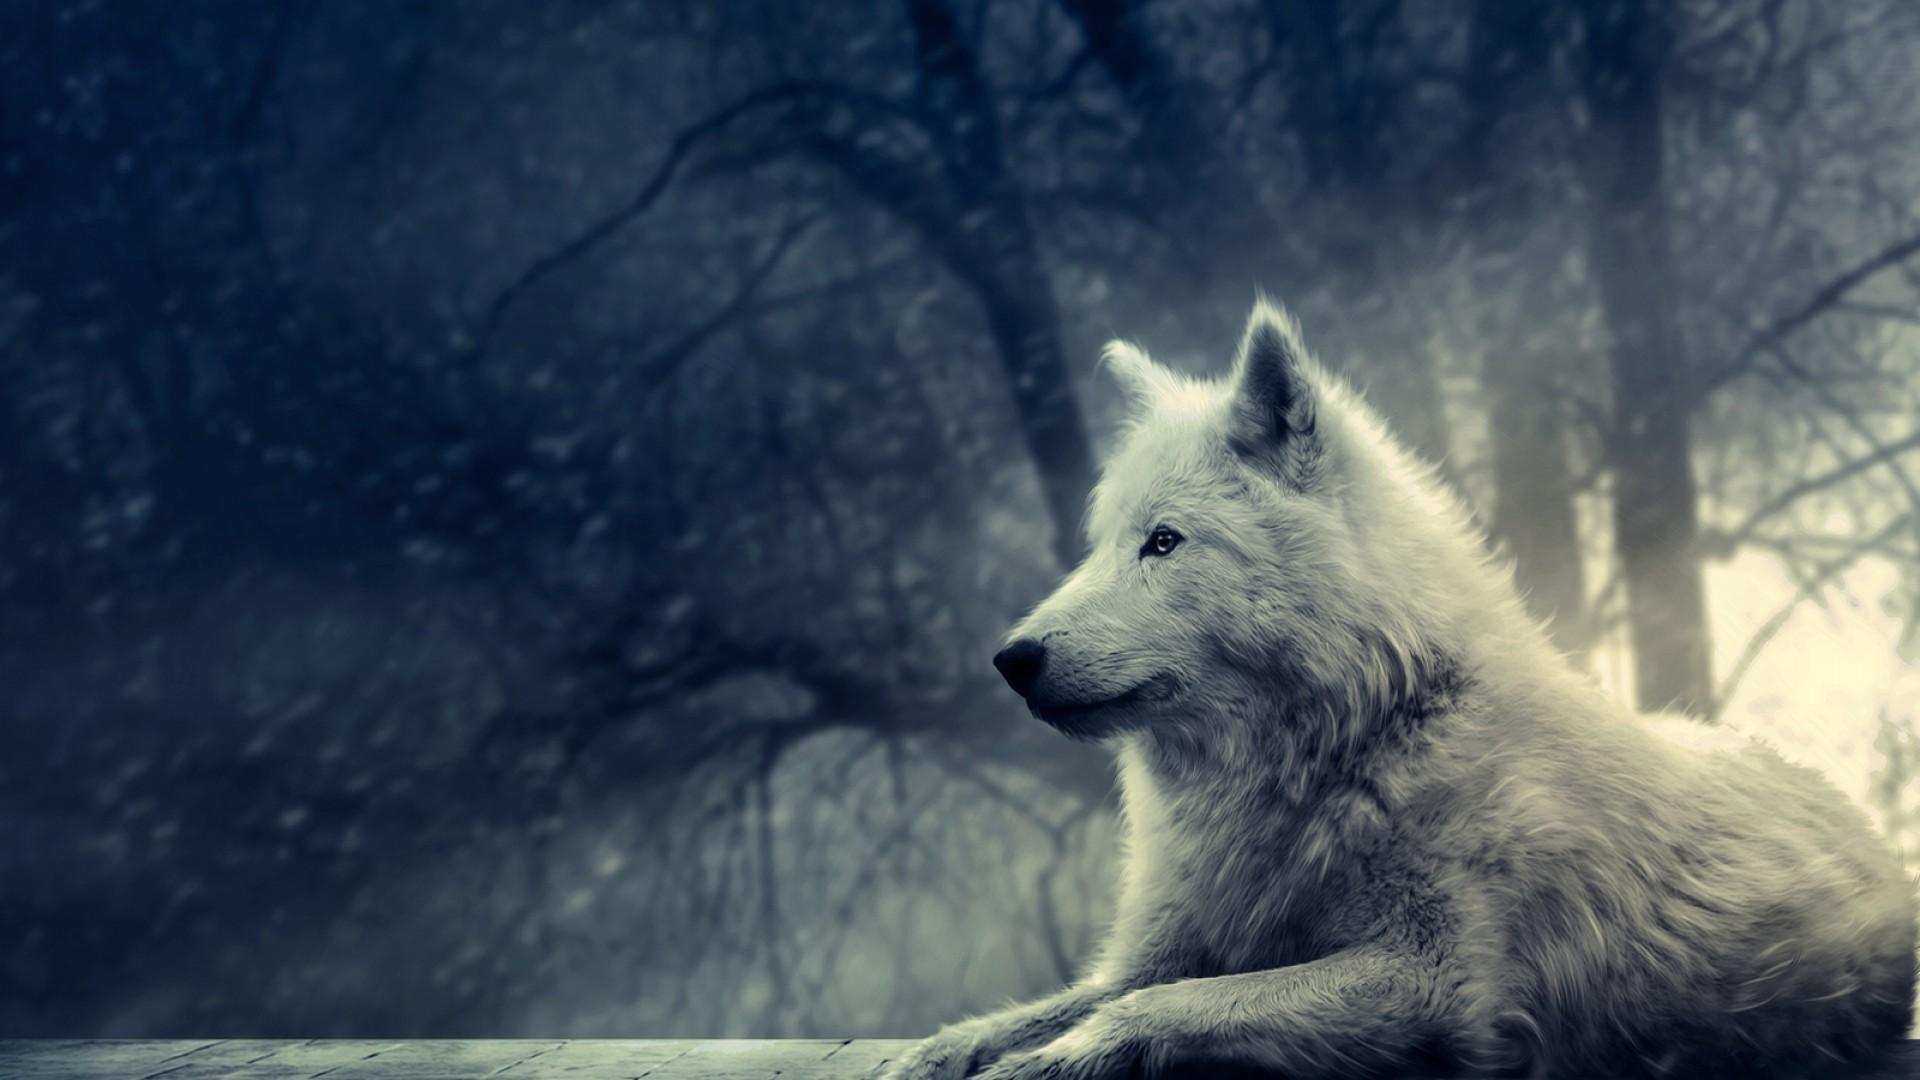 wallpaper of wolf desktop backgrounds hd pics pc ~ gipsypixel